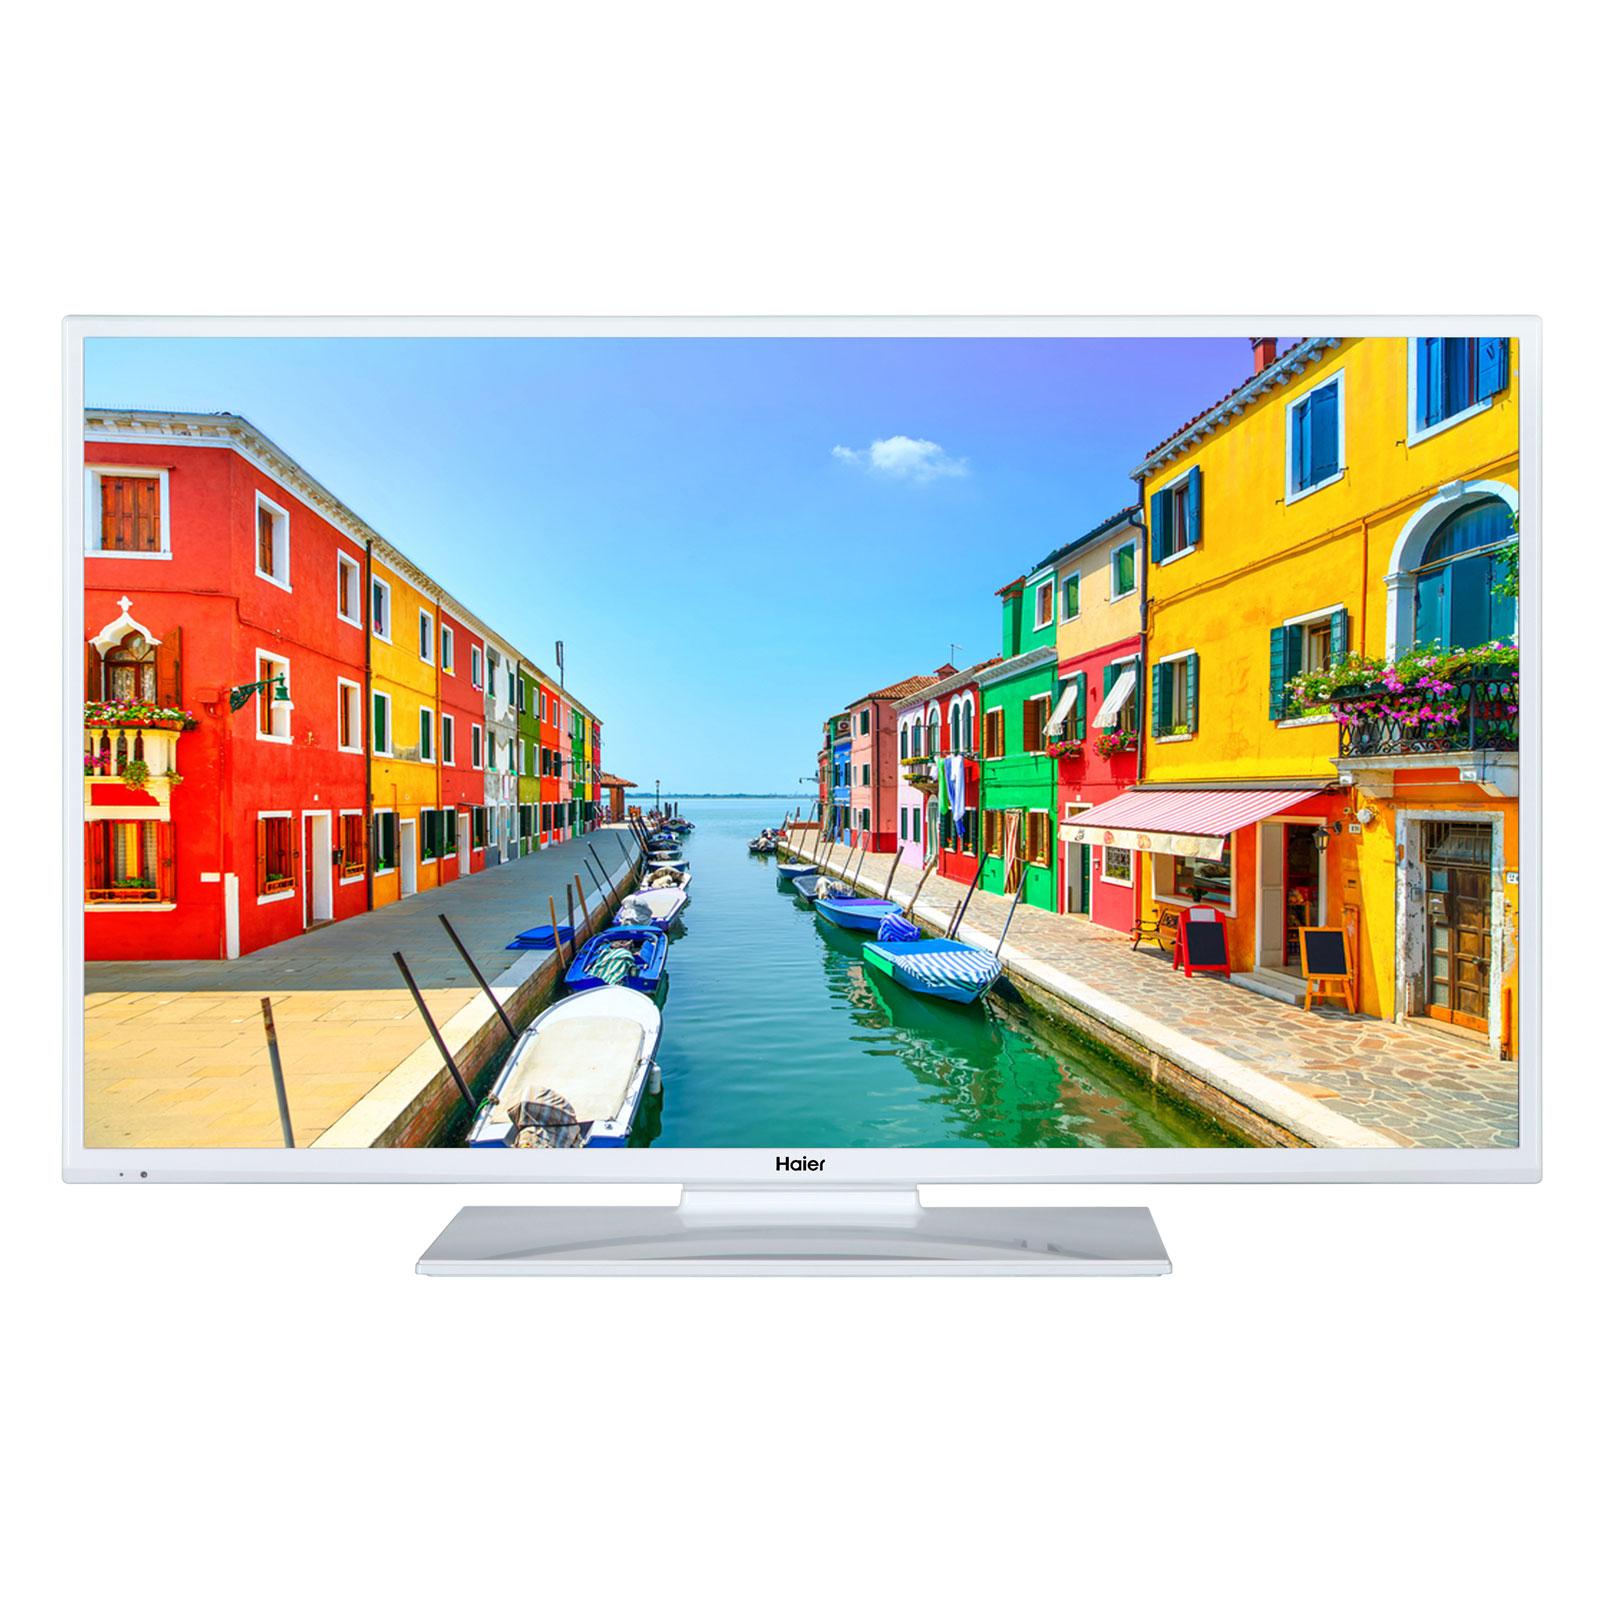 "TV Haier LEH28V100W Blanc Téléviseur LED HD 28"" (71 cm) 16/9 - 1366 x 768 pixels - HDTV - 100 Hz"